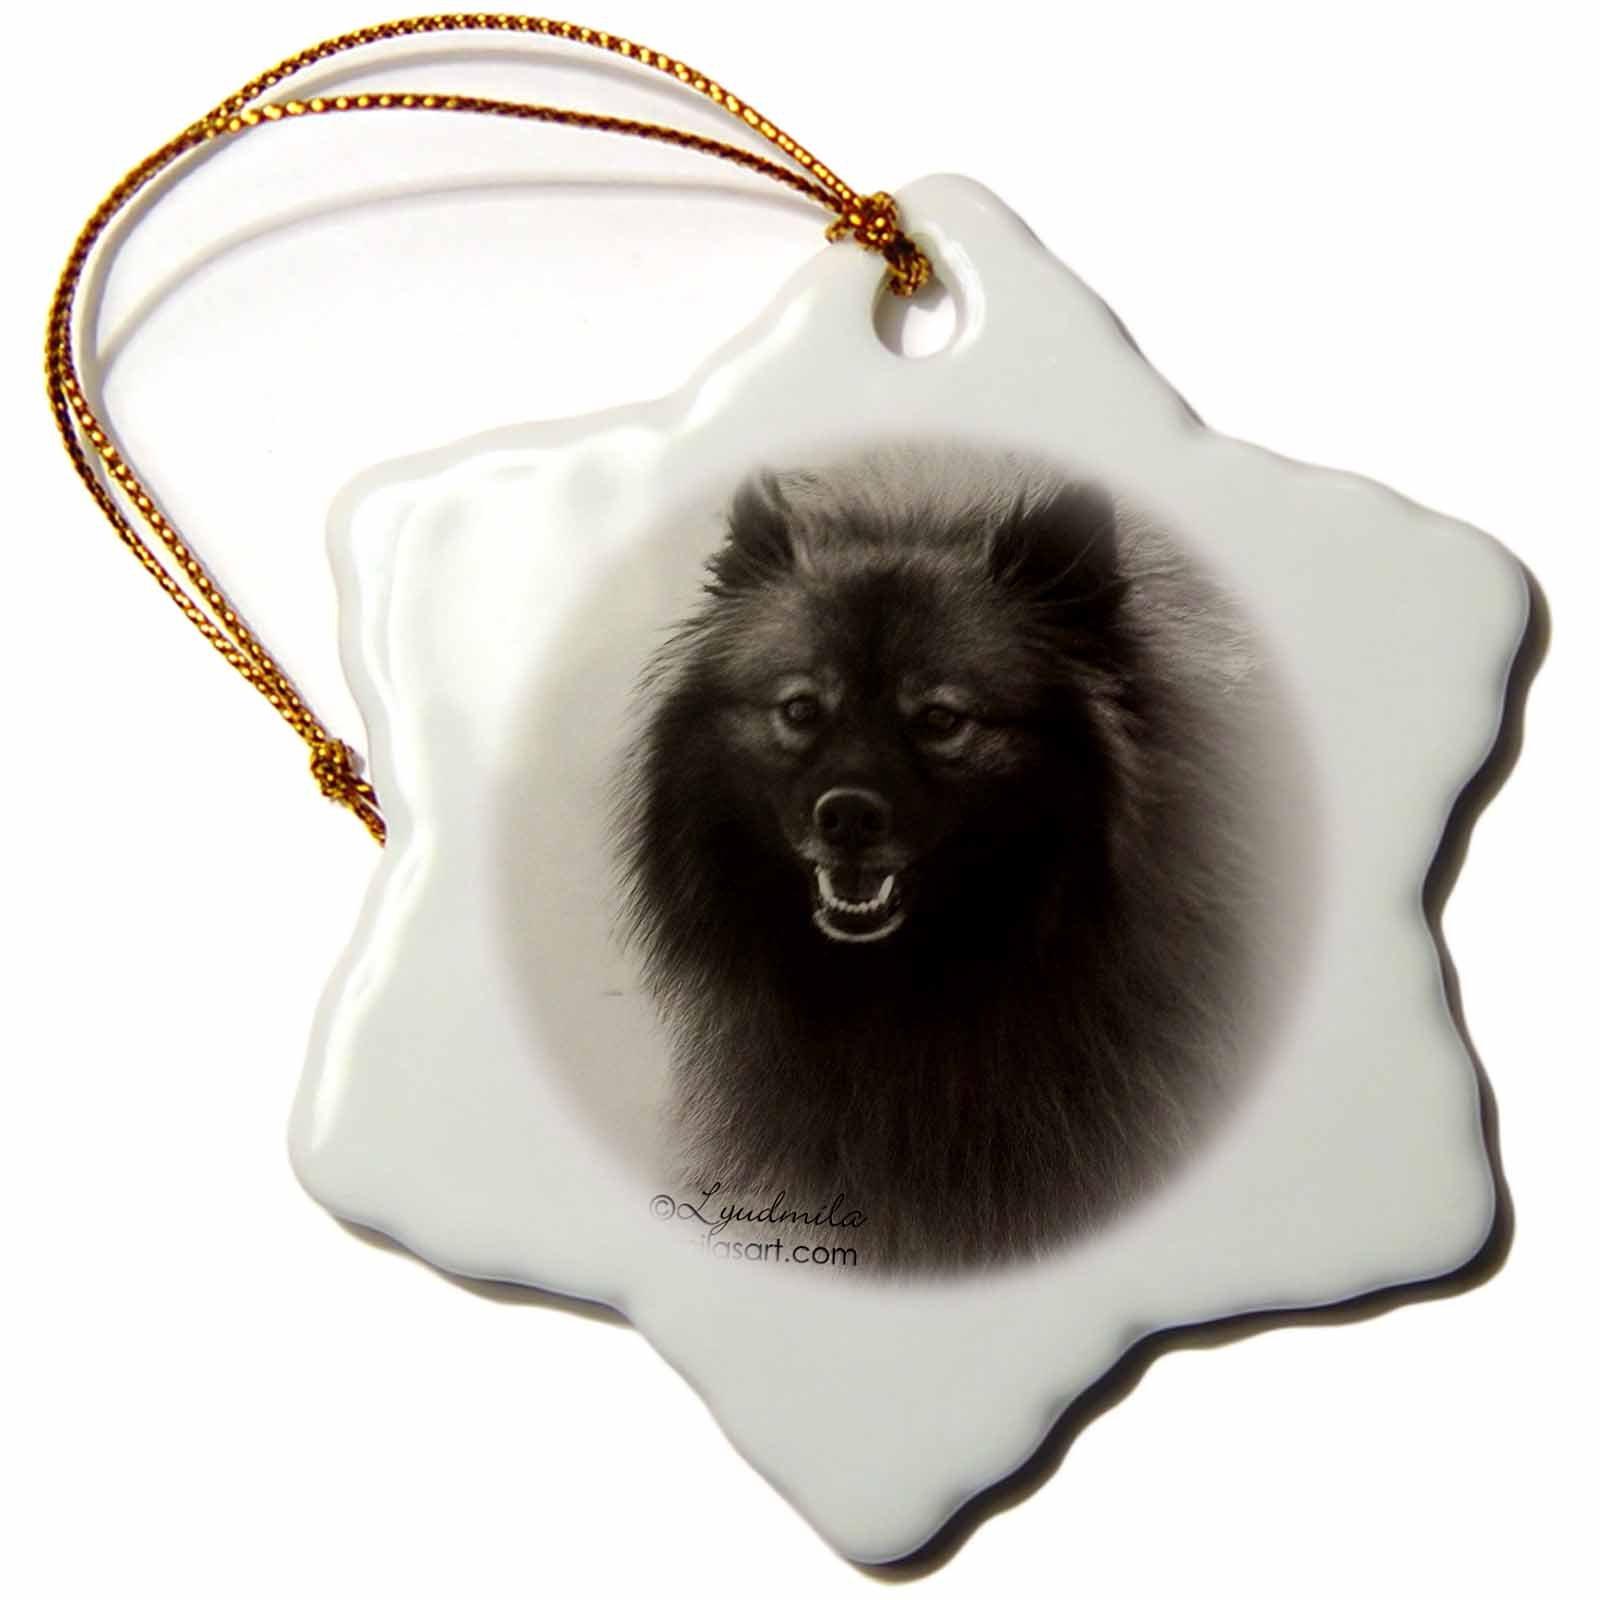 3dRose German Spitz - Snowflake Ornament, Porcelain, 3-inch (orn_4628_1)